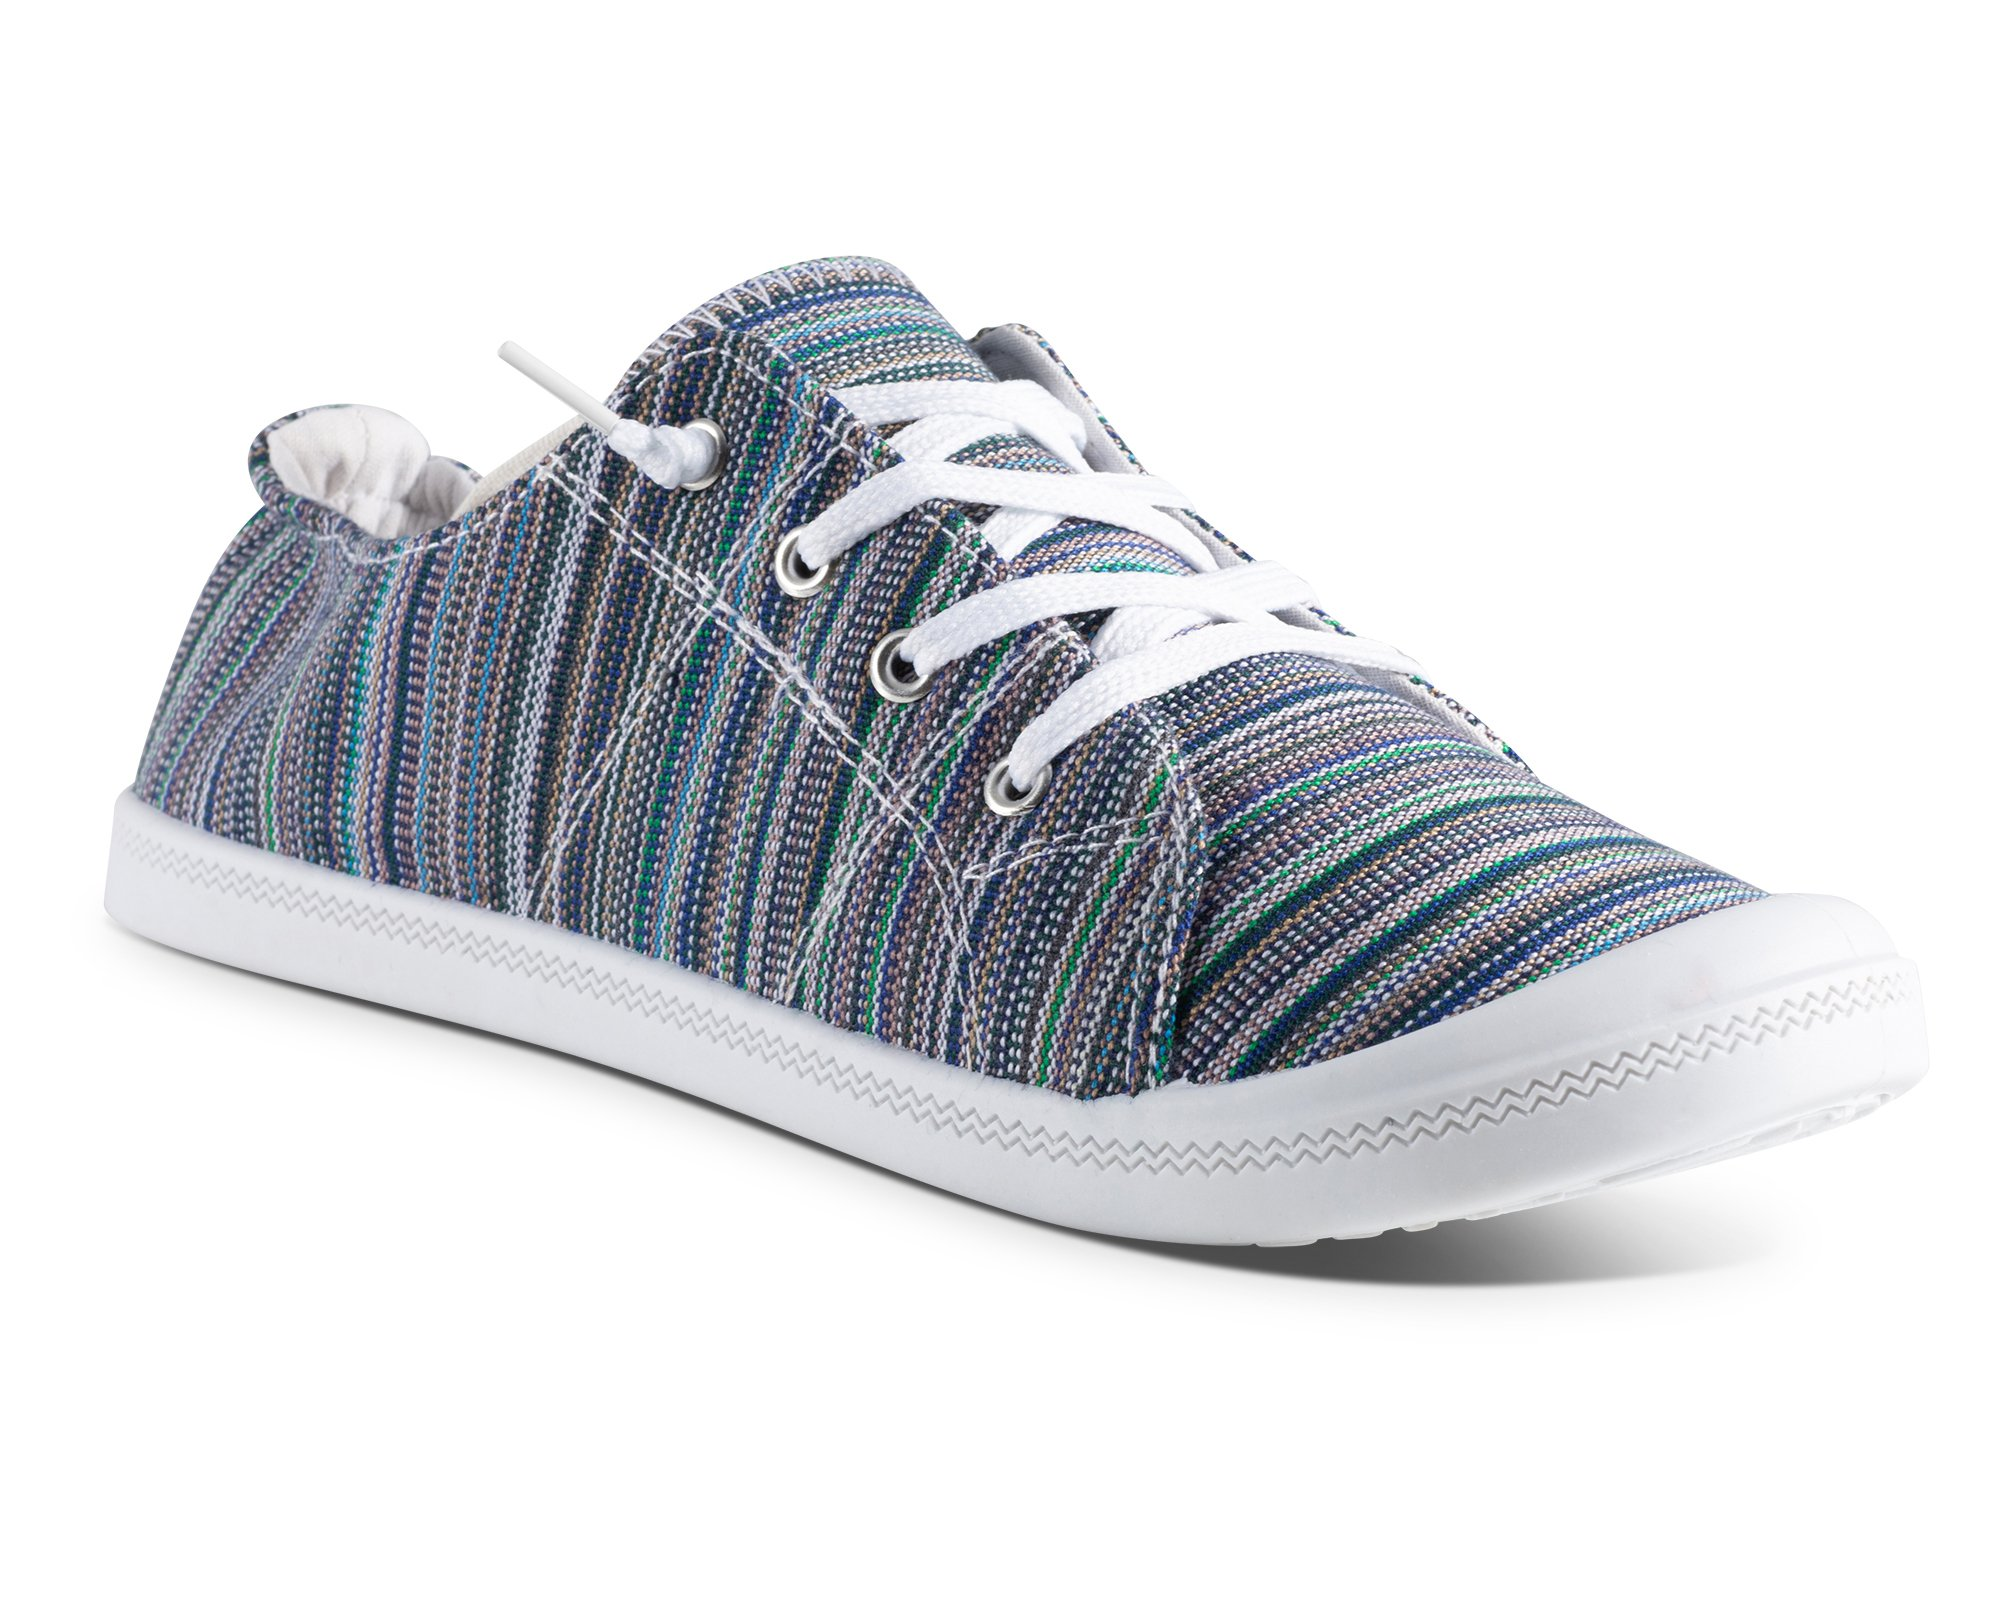 Twisted Womens Andrea Slip-On Canvas Sneakers - ANDREA04 Multi Stripe, Size 6